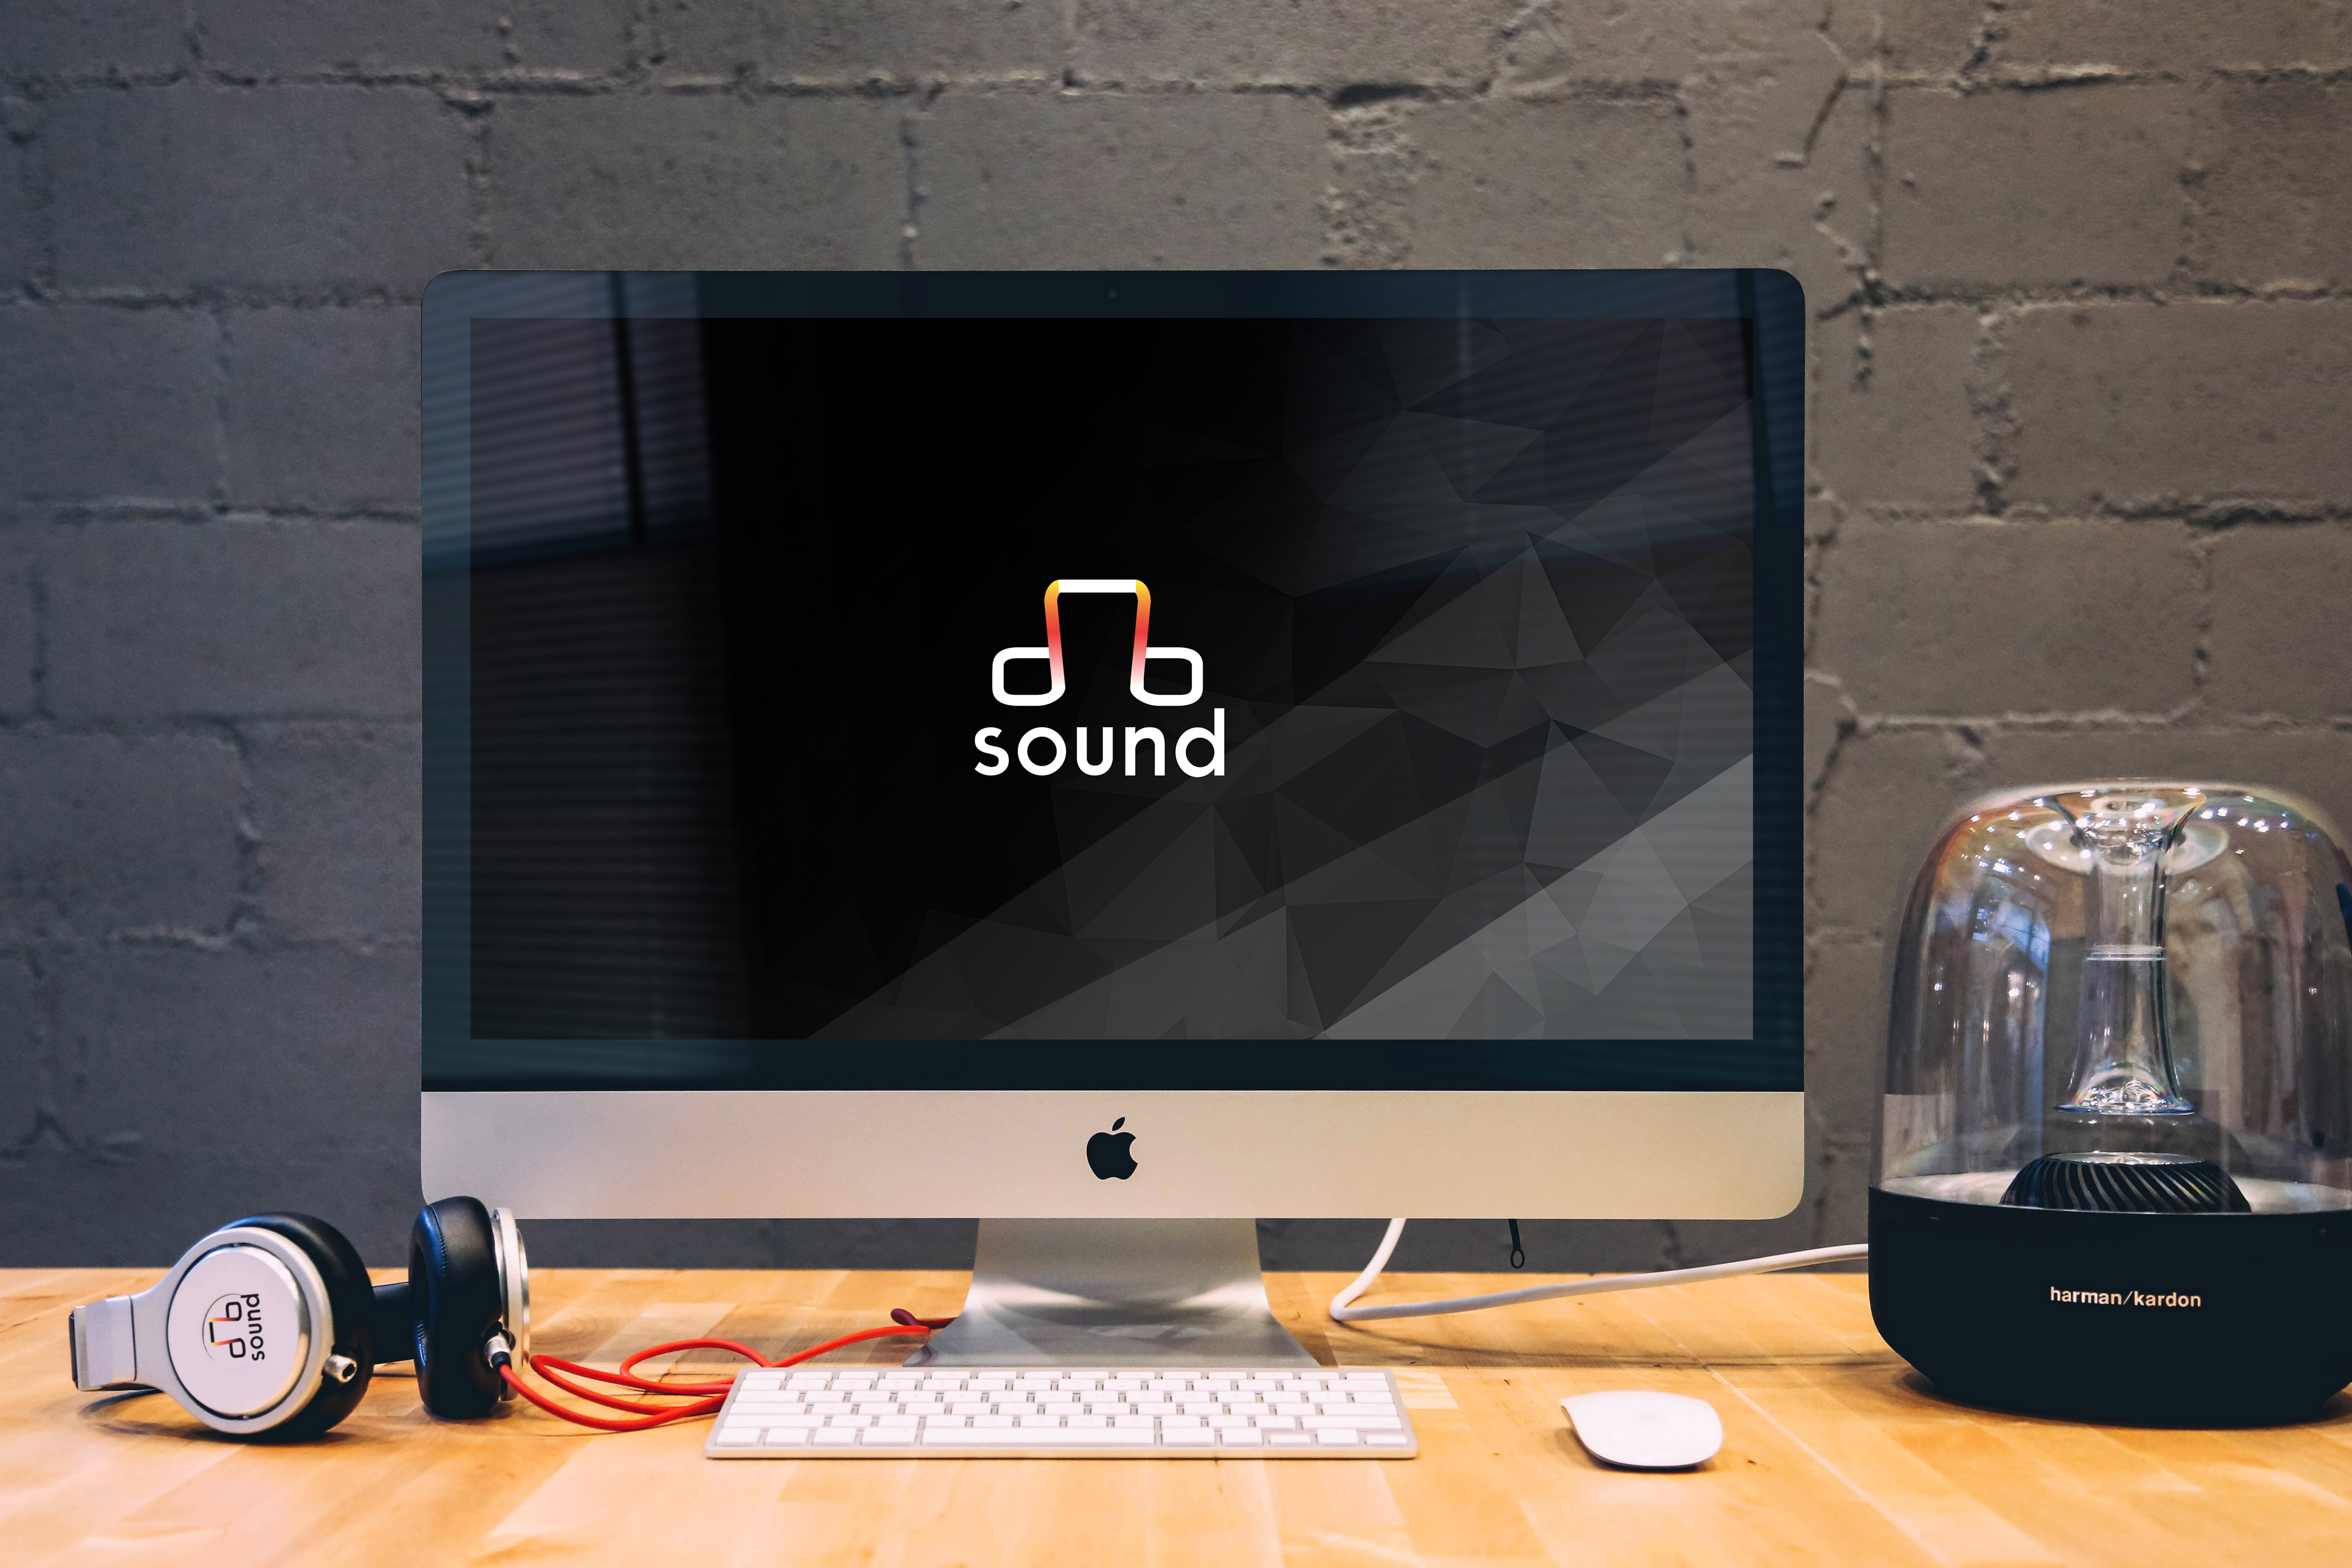 Создание логотипа для компании dB Sound фото f_58459baedccaf317.jpg